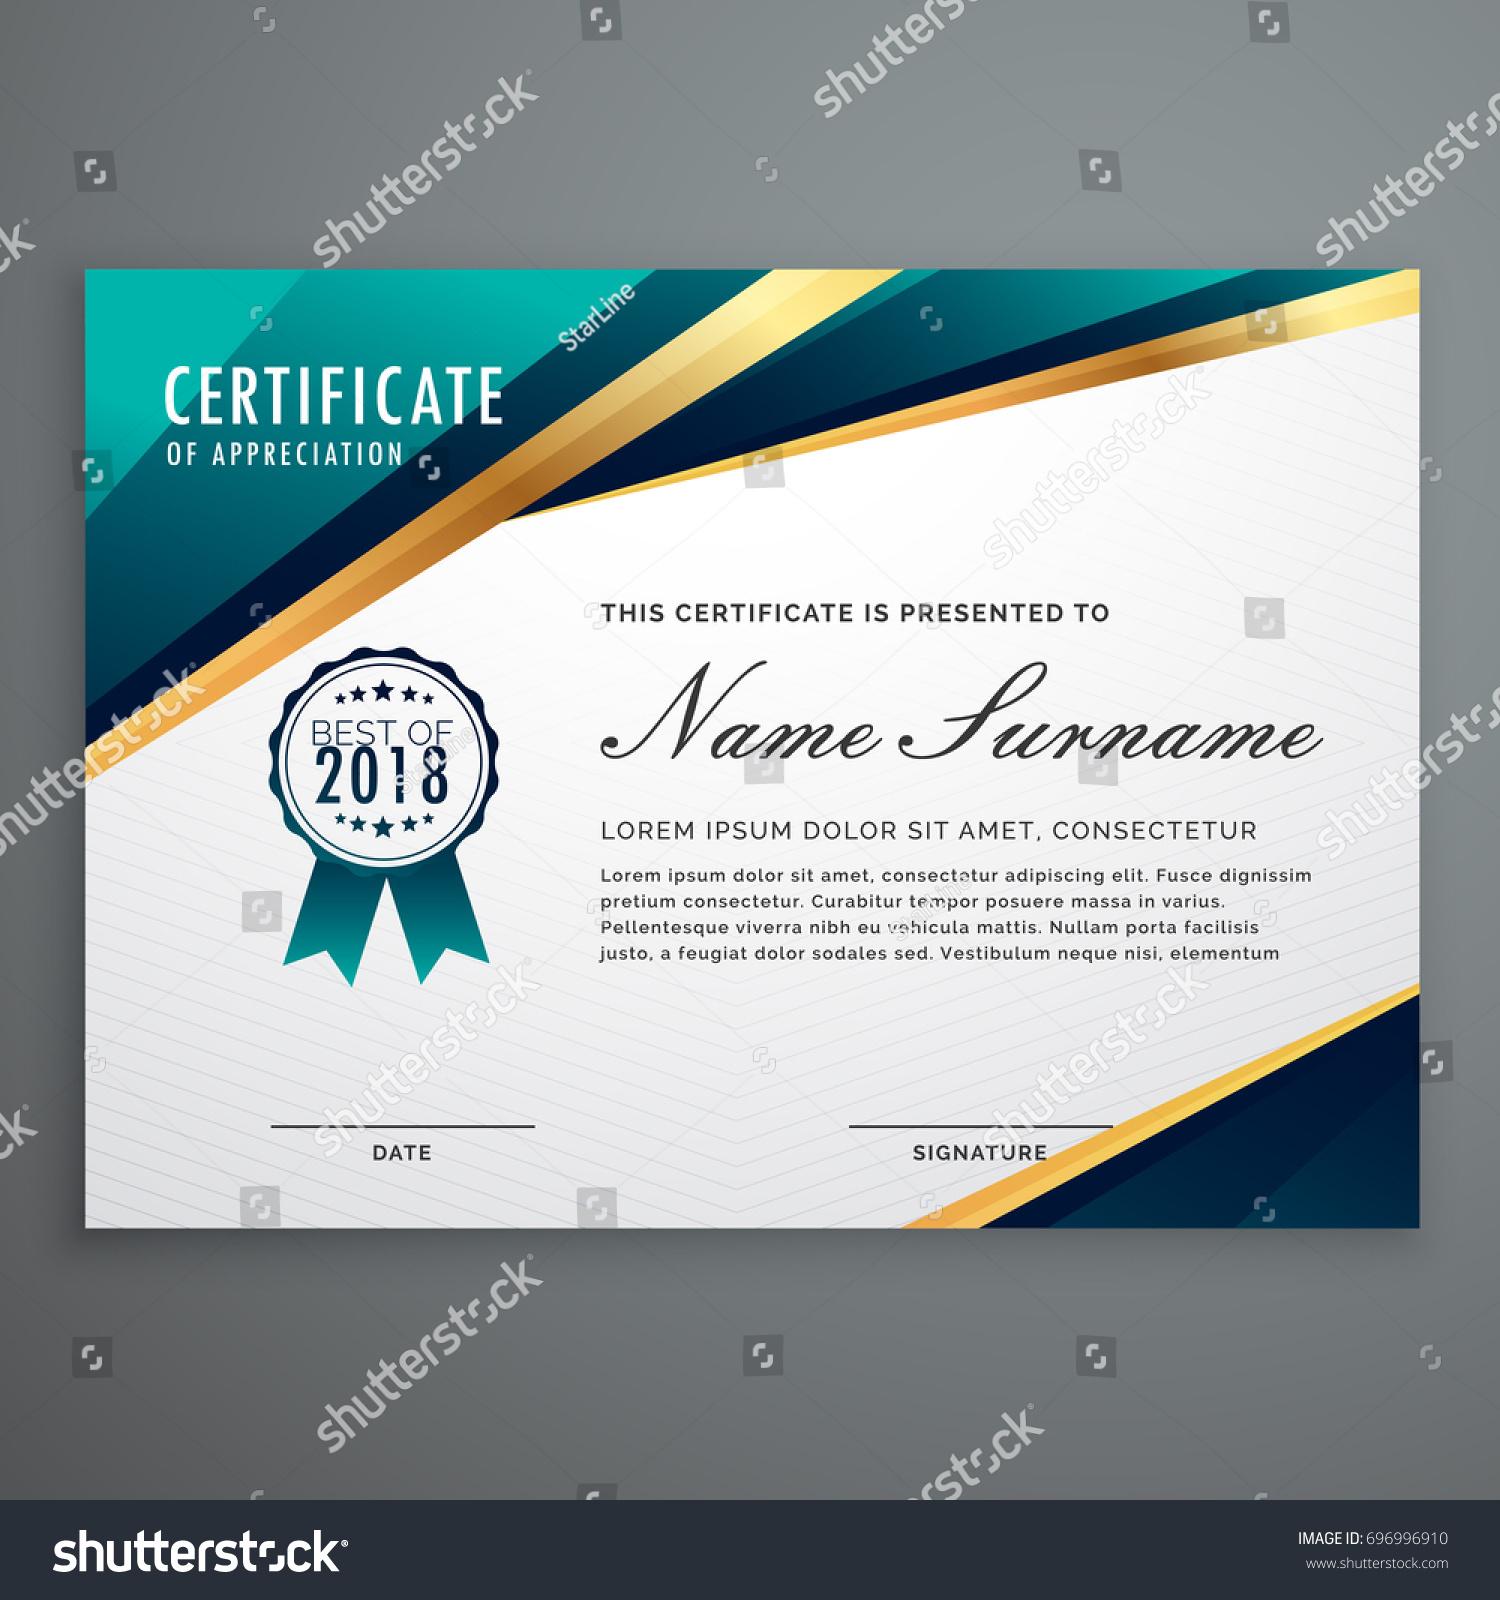 Certificate design luxury golden shapes diploma stock vector certificate design with luxury golden shapes diploma template alramifo Images